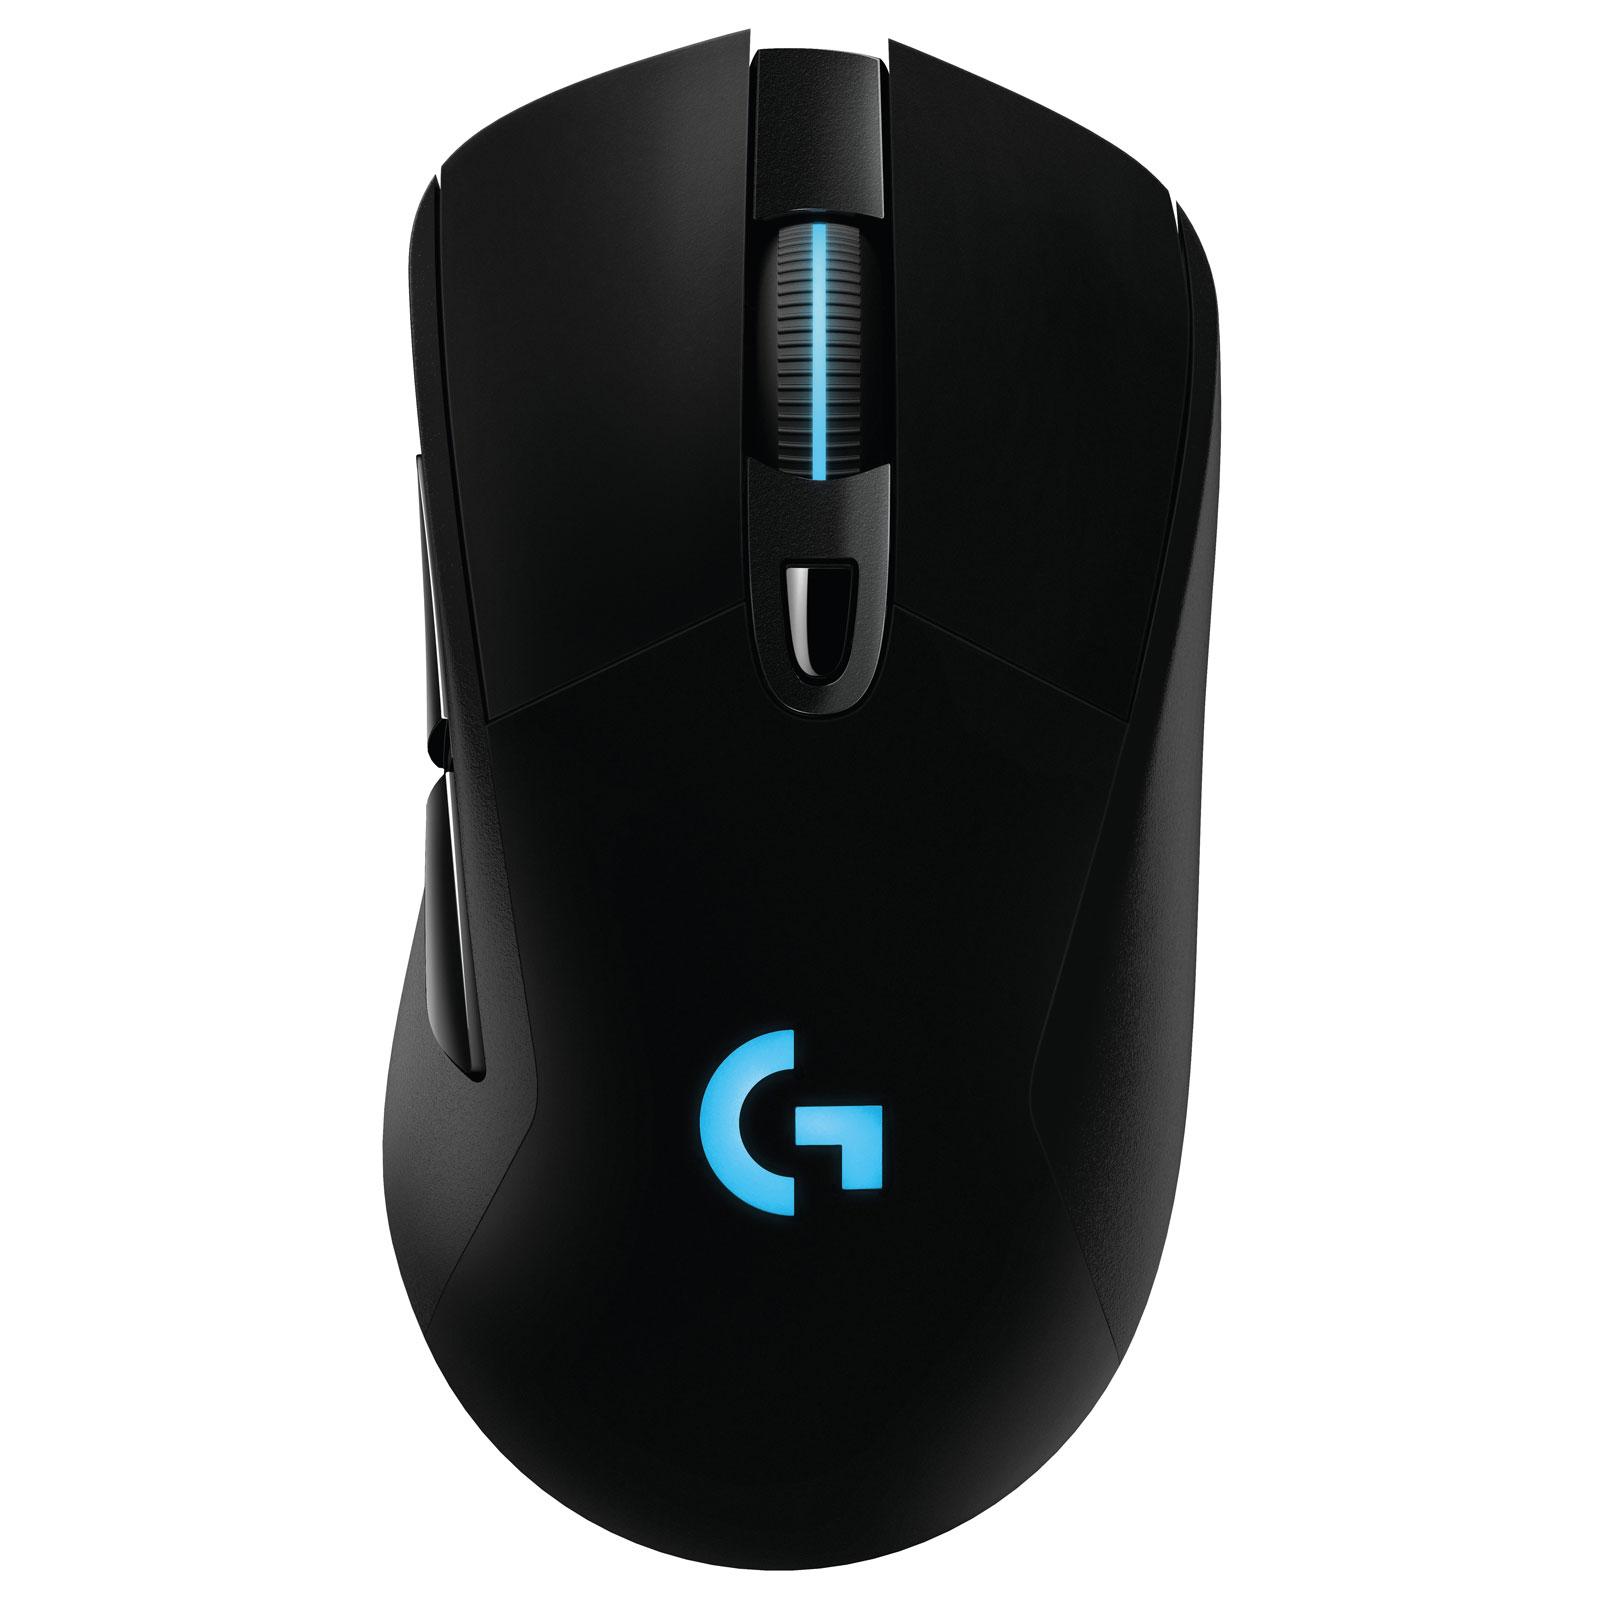 Logitech G403 Wireless - Souris PC Logitech - Cybertek.fr - 3